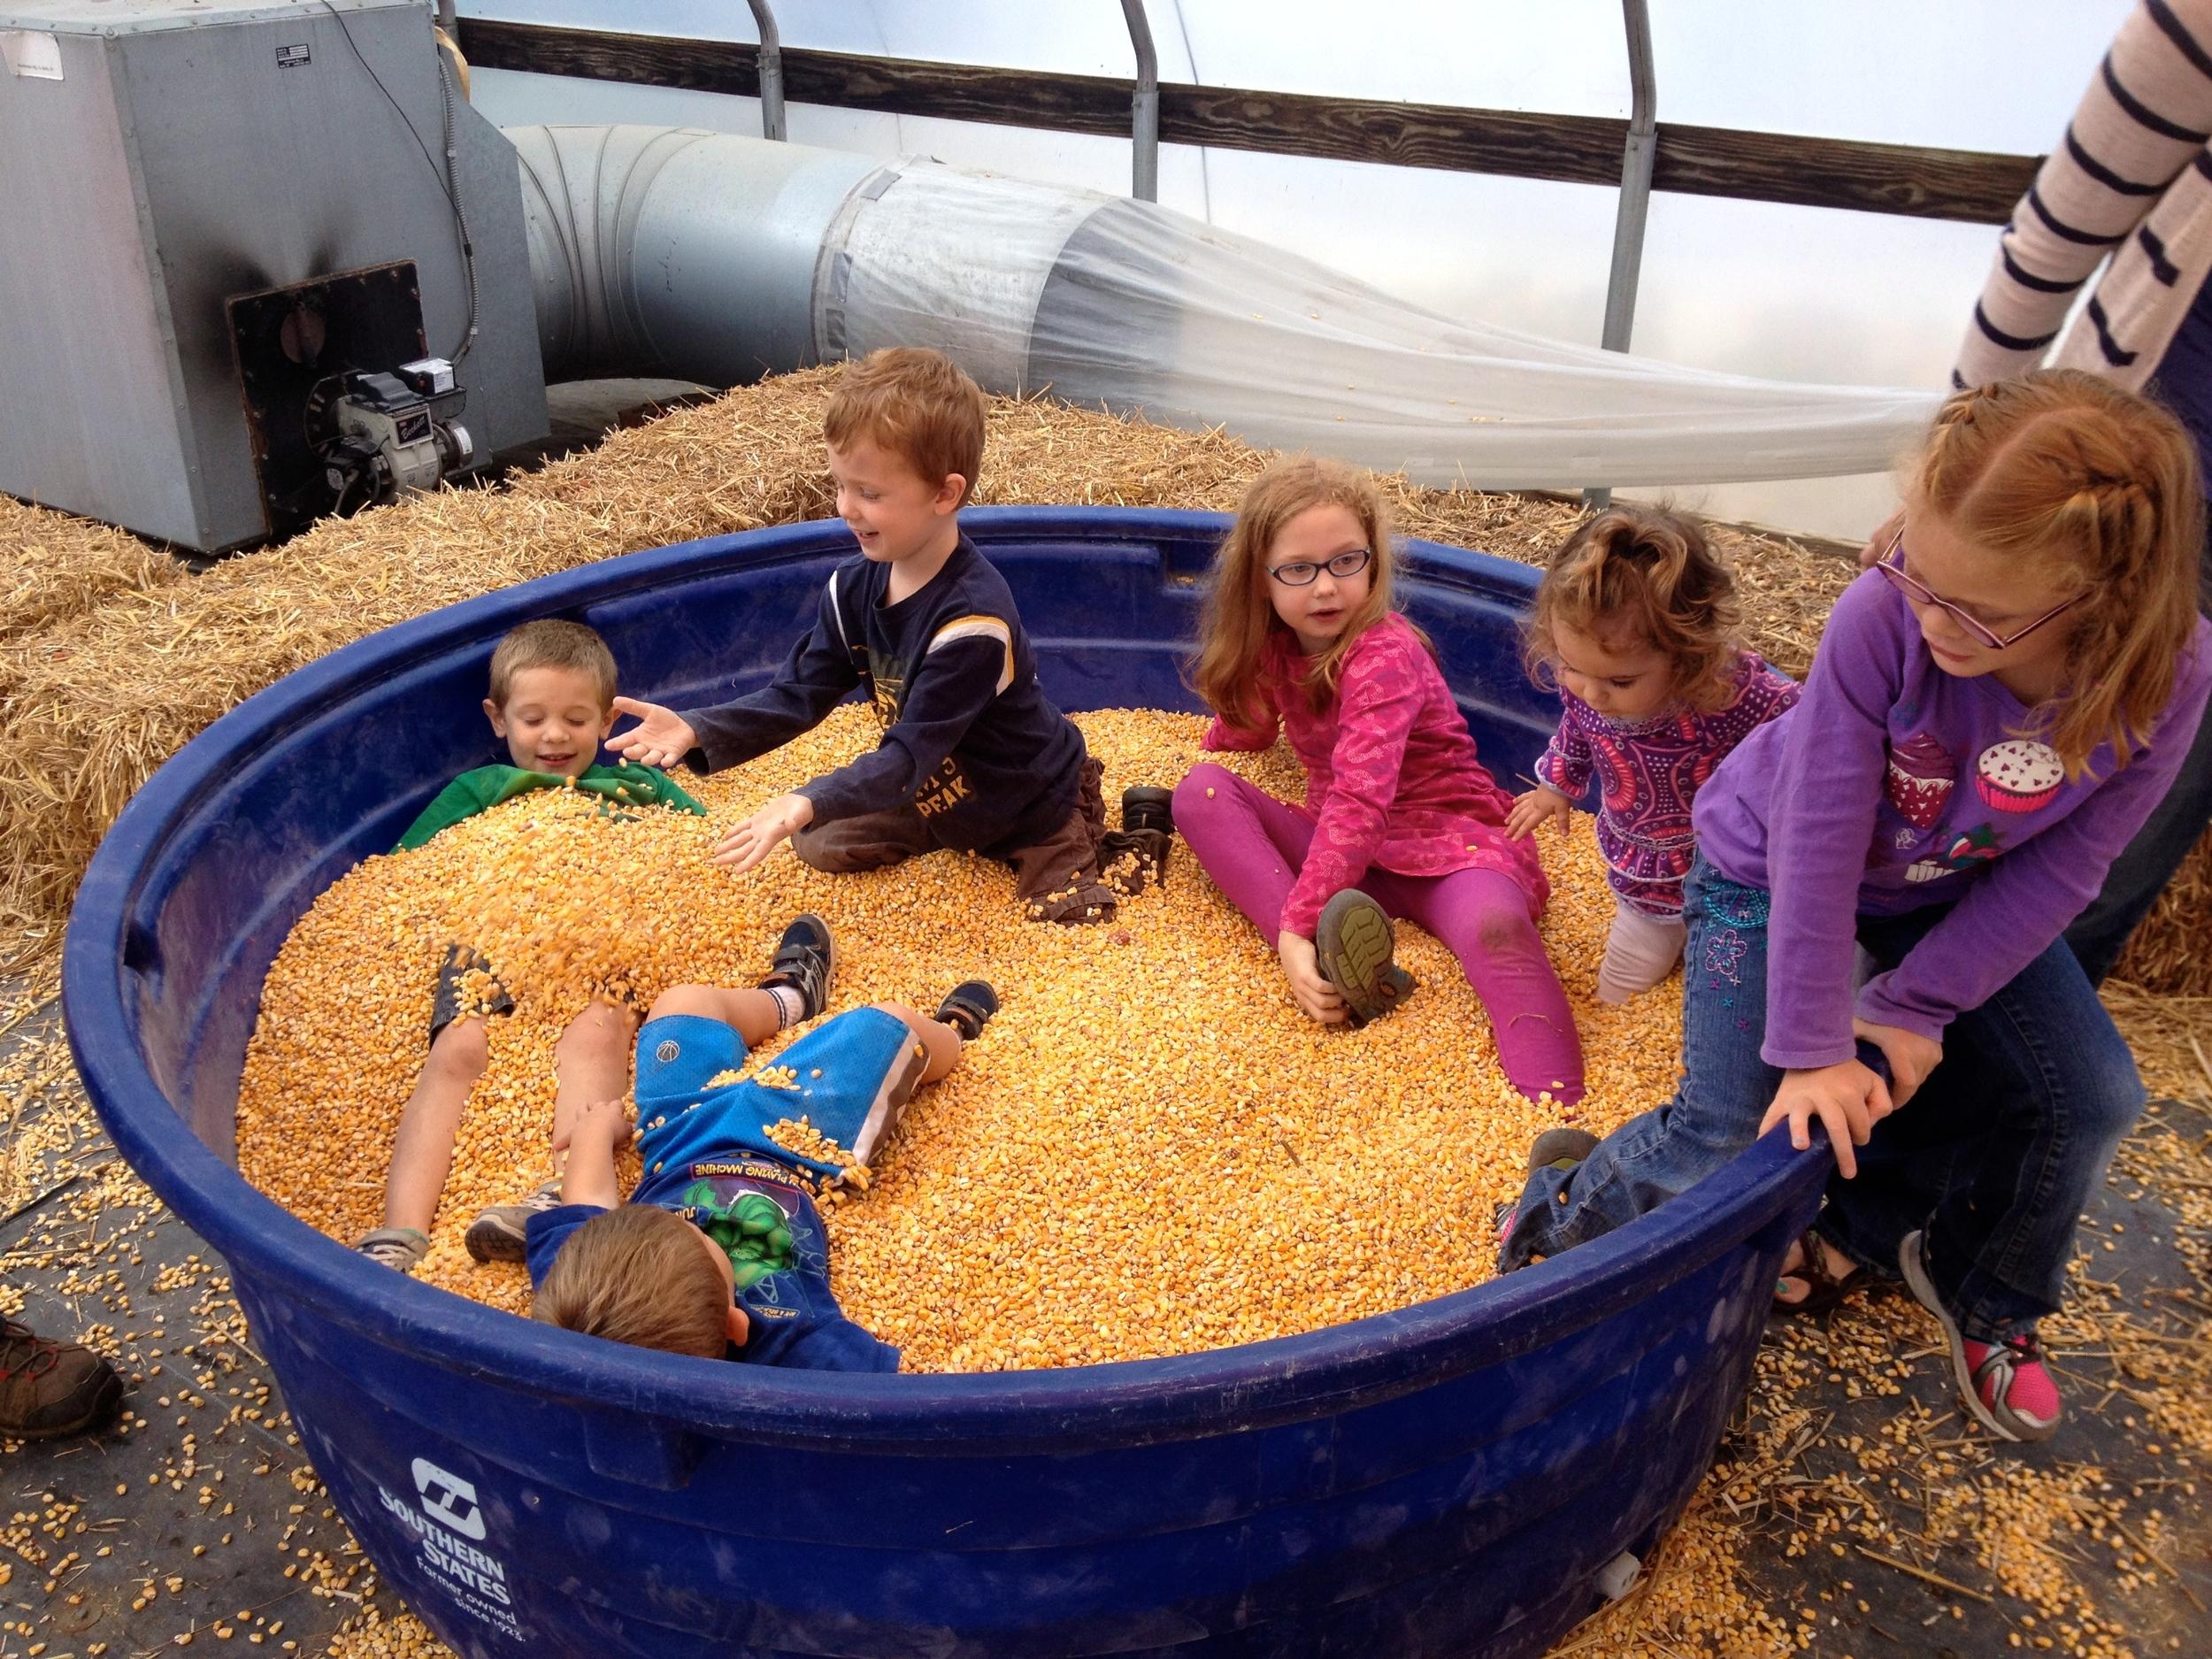 The Lyda-Craig corn pile up